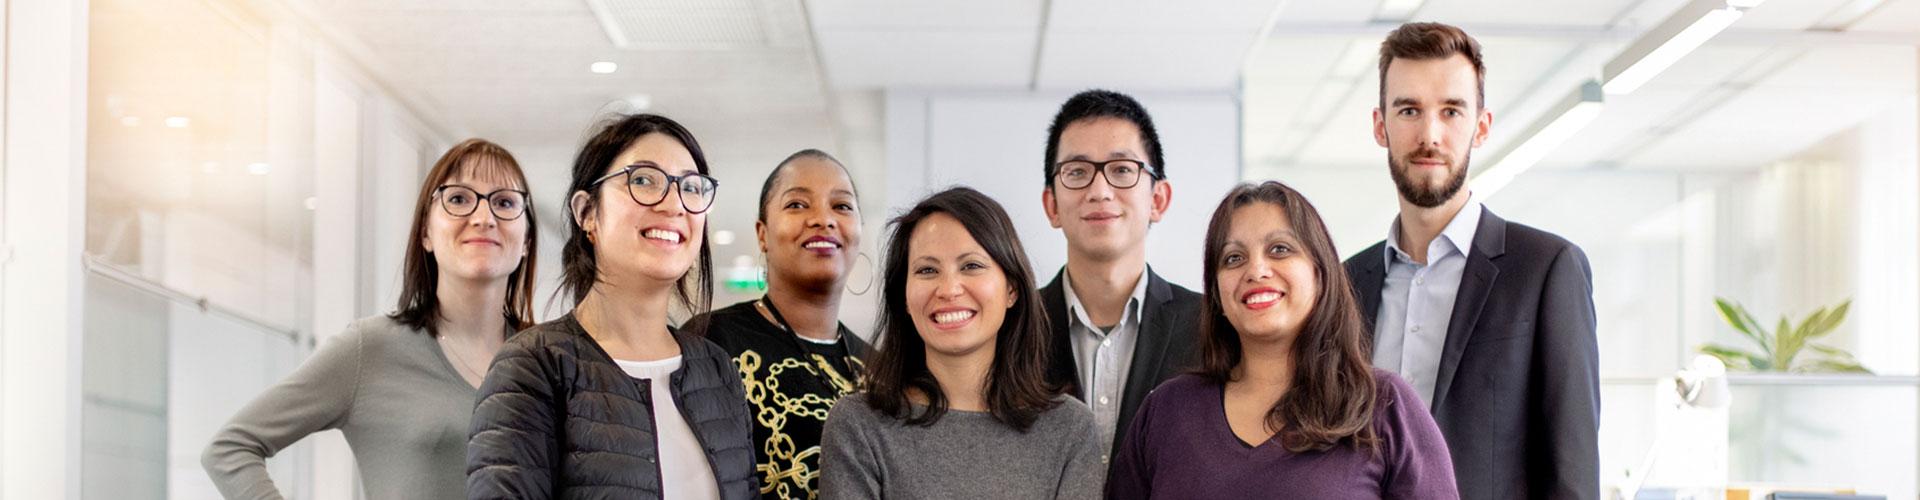 careers diversity